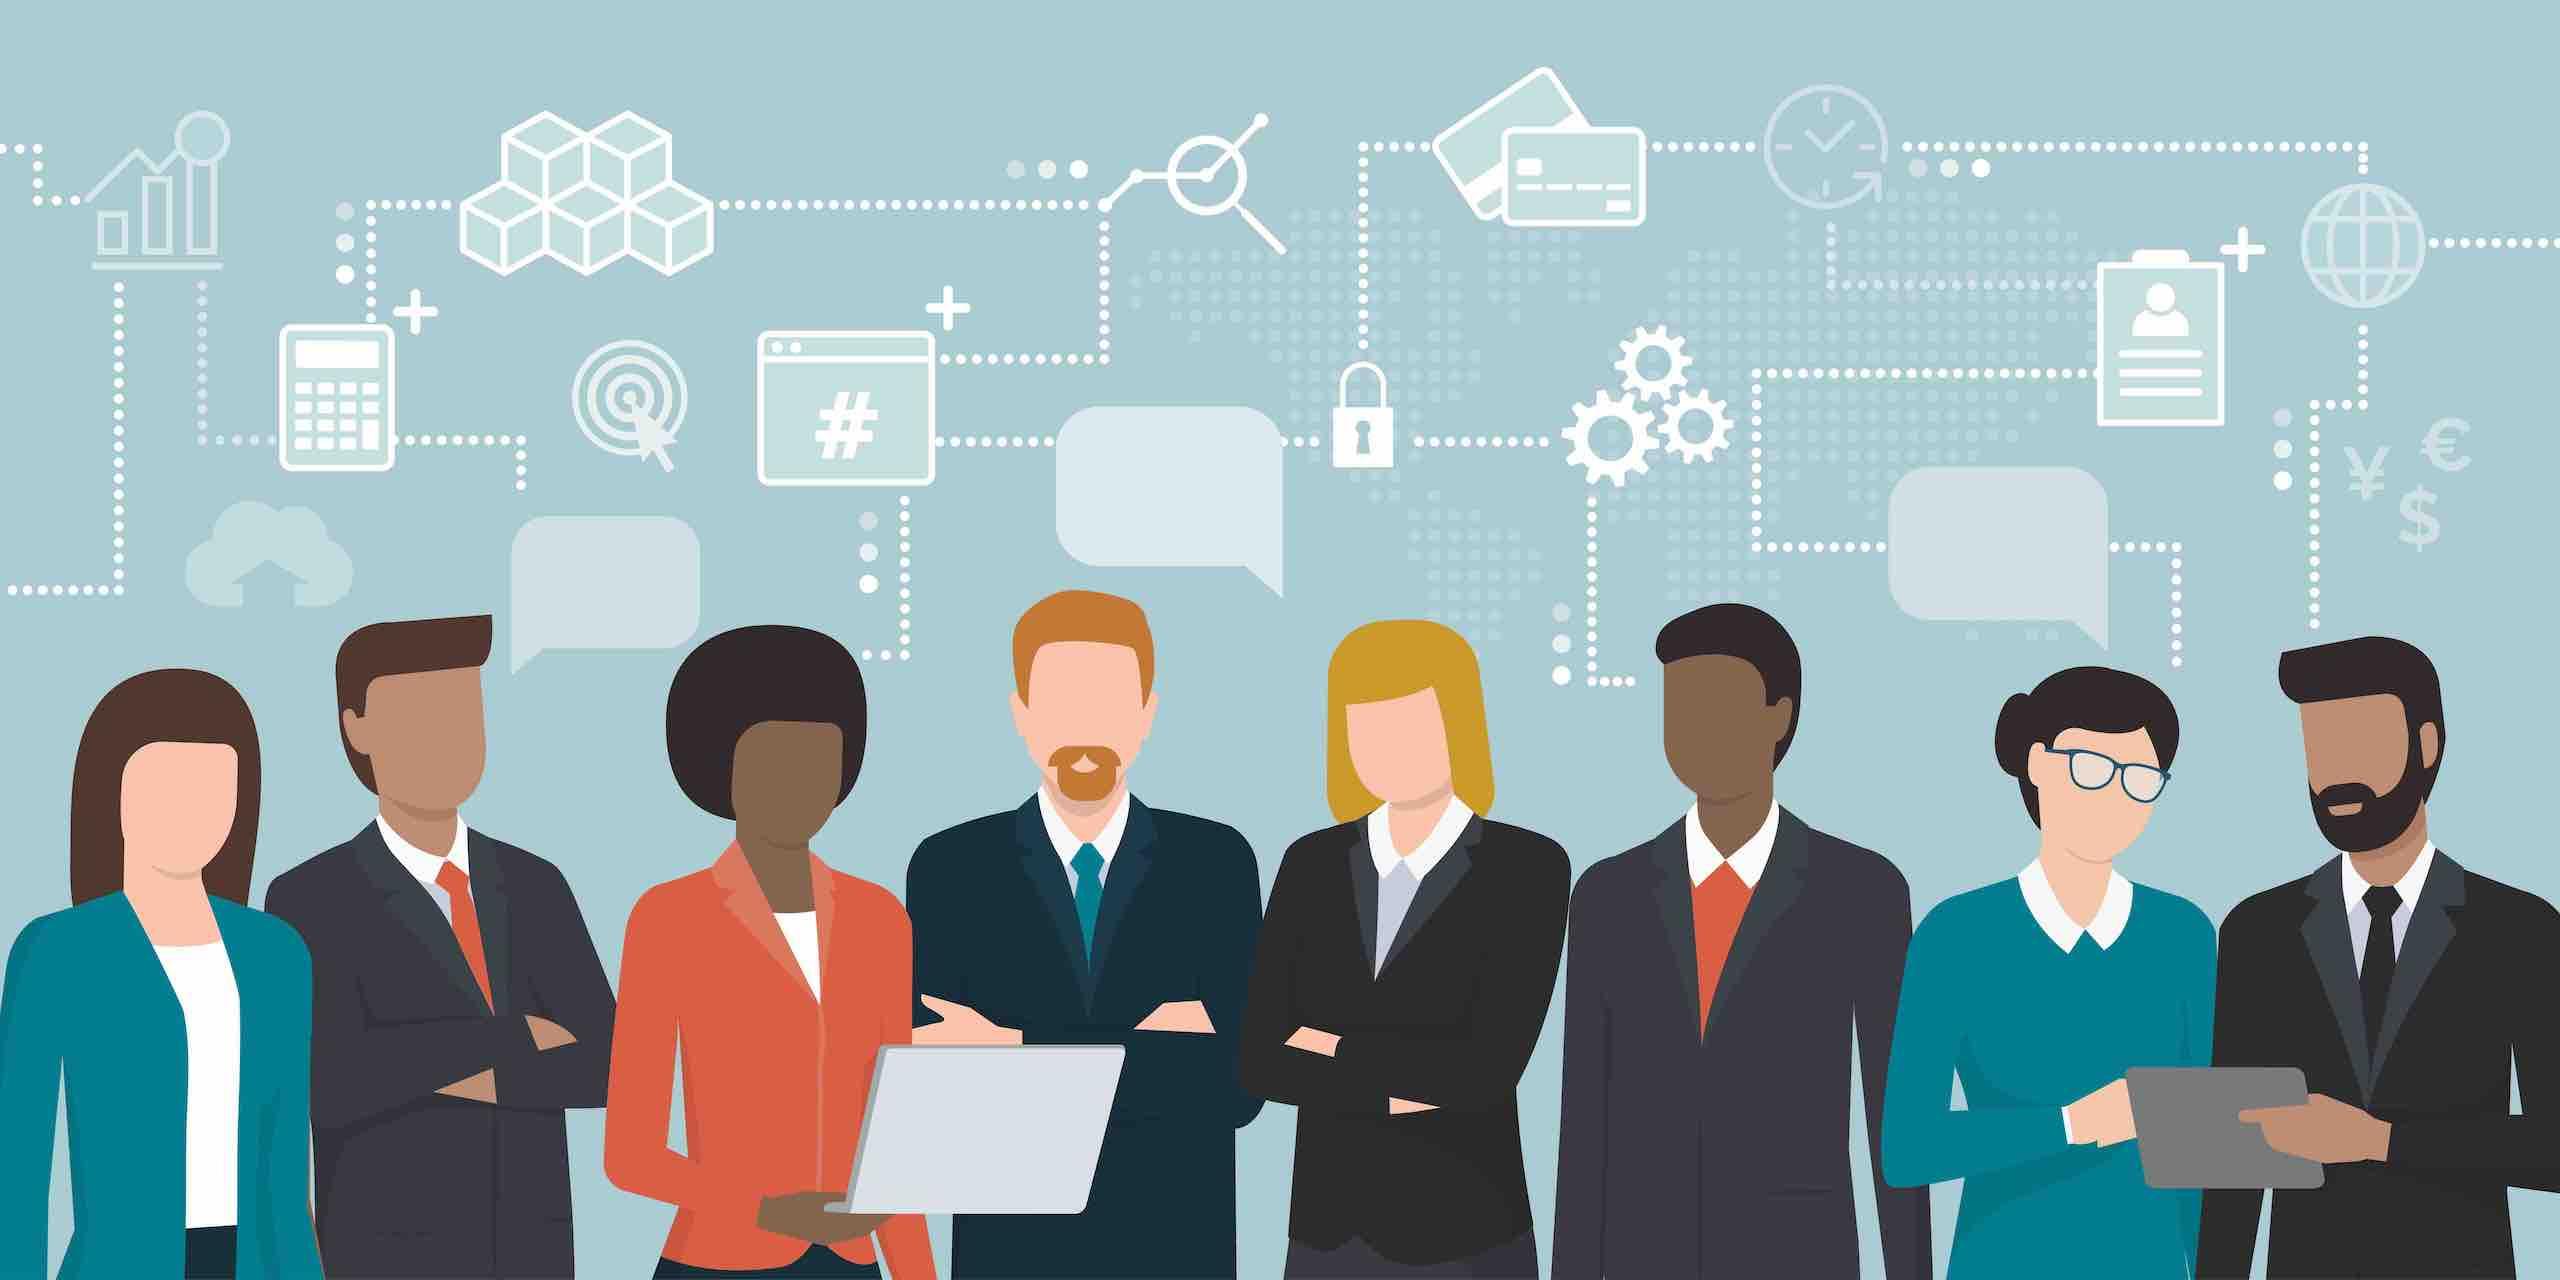 CXOs, Strategic Advisors and Top Independent Professionals